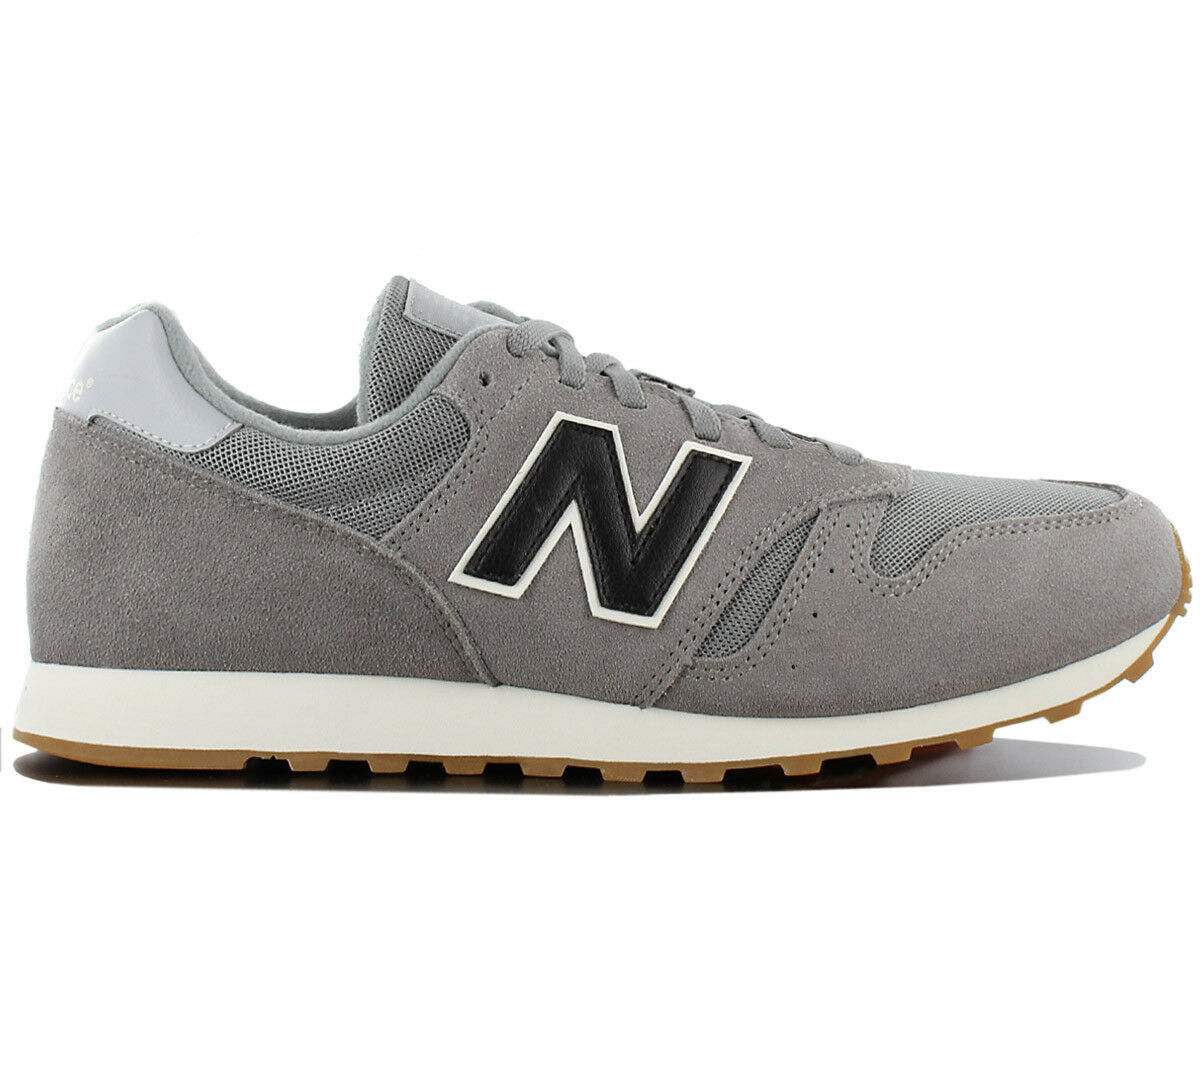 New Balance Classics 373 Men's Sneakers shoes Grey ML373GKG ML373 Trainers